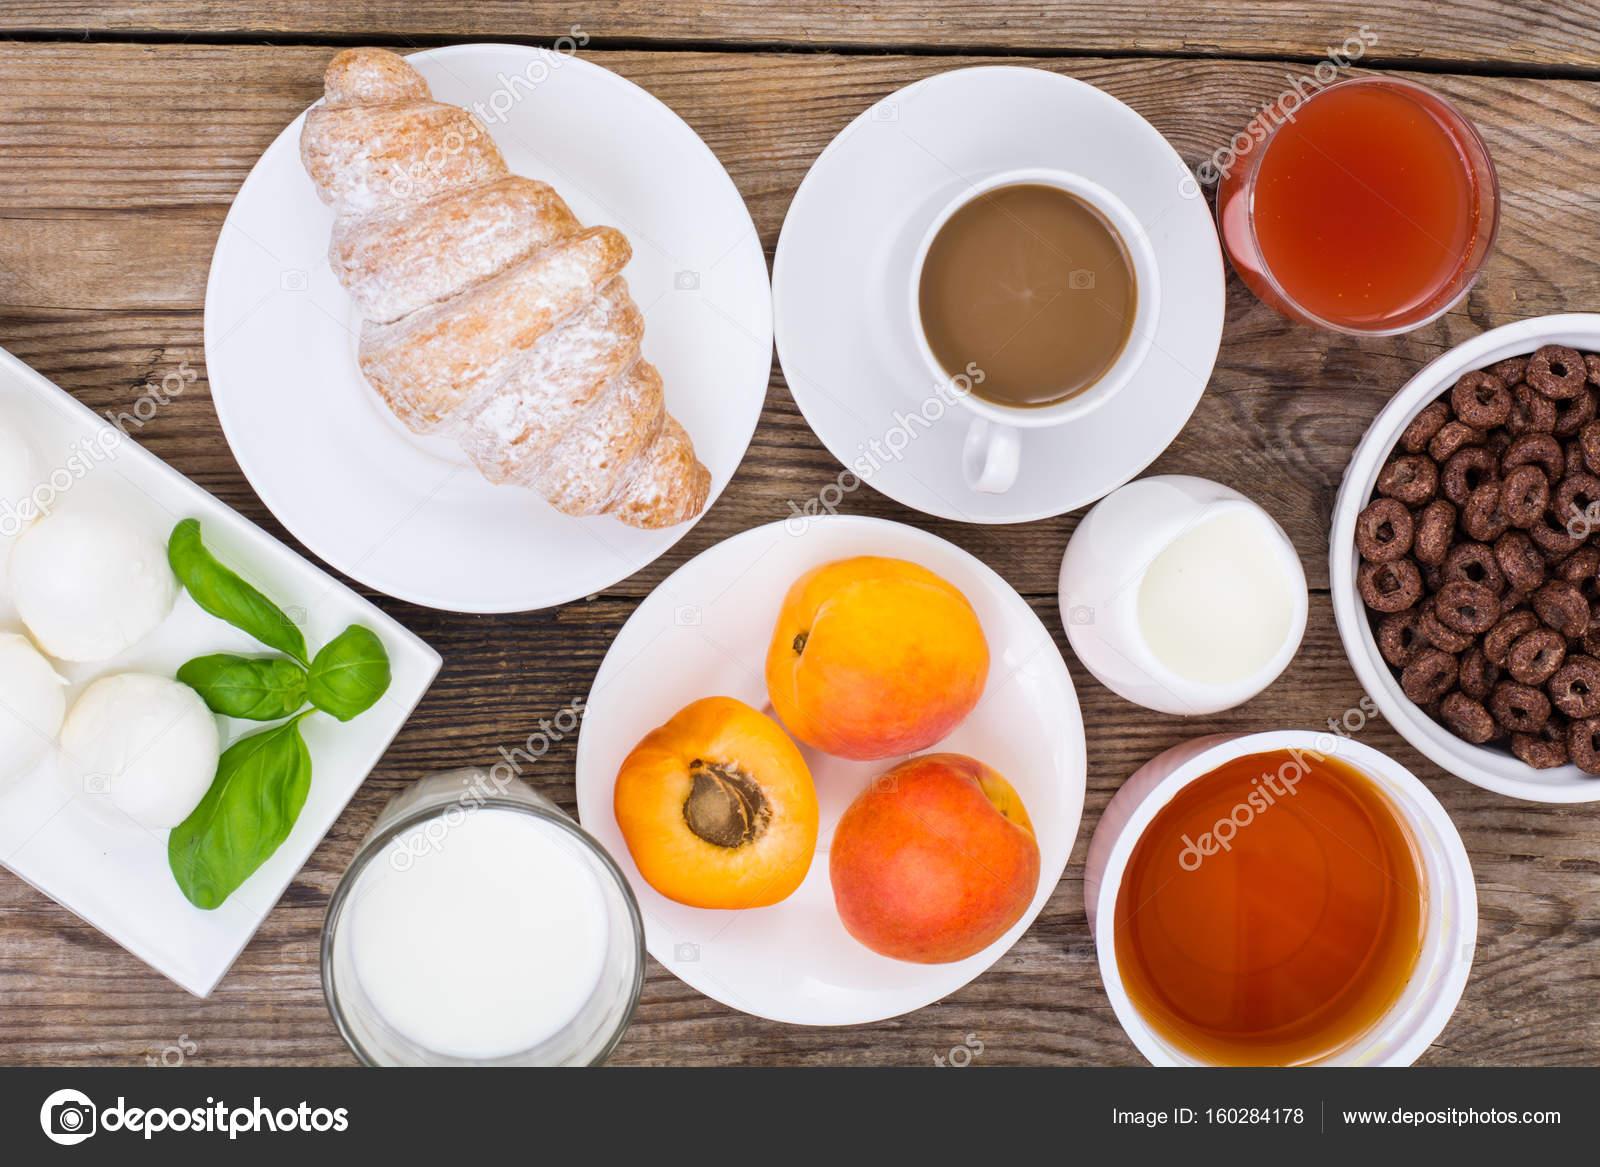 Breakfast table setting with chocolate flakes mozzarella jui u2014 Stock Photo & Breakfast table setting with chocolate flakes mozzarella jui ...